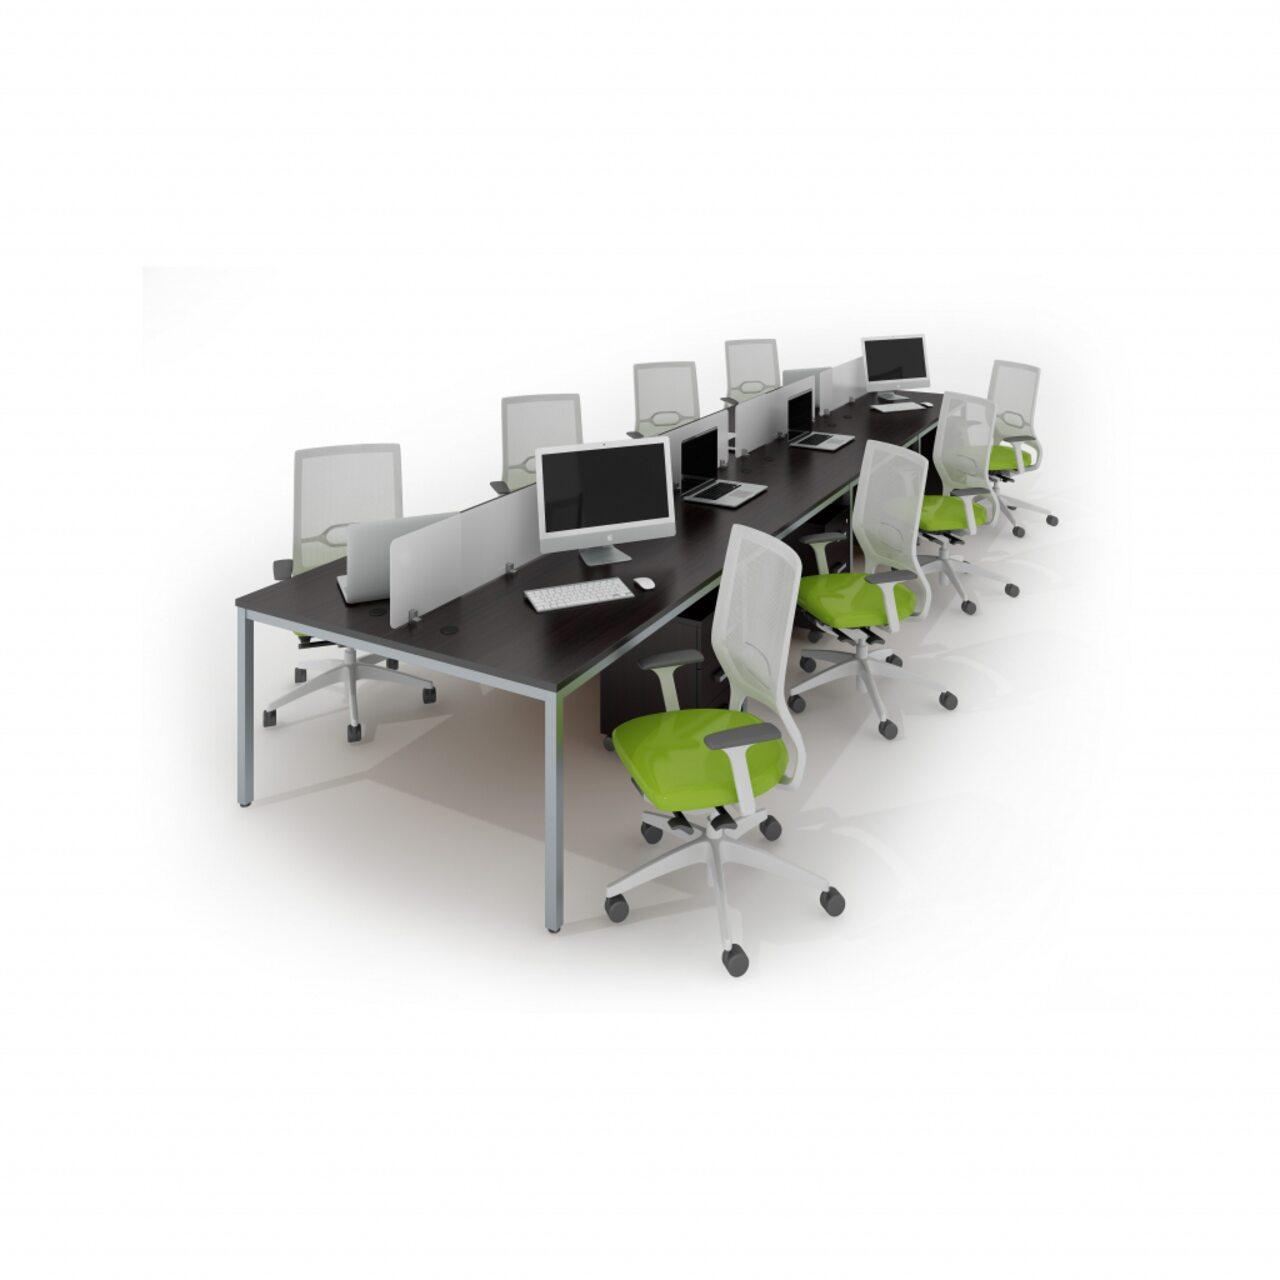 Мебель для персонала Avance - фото 5